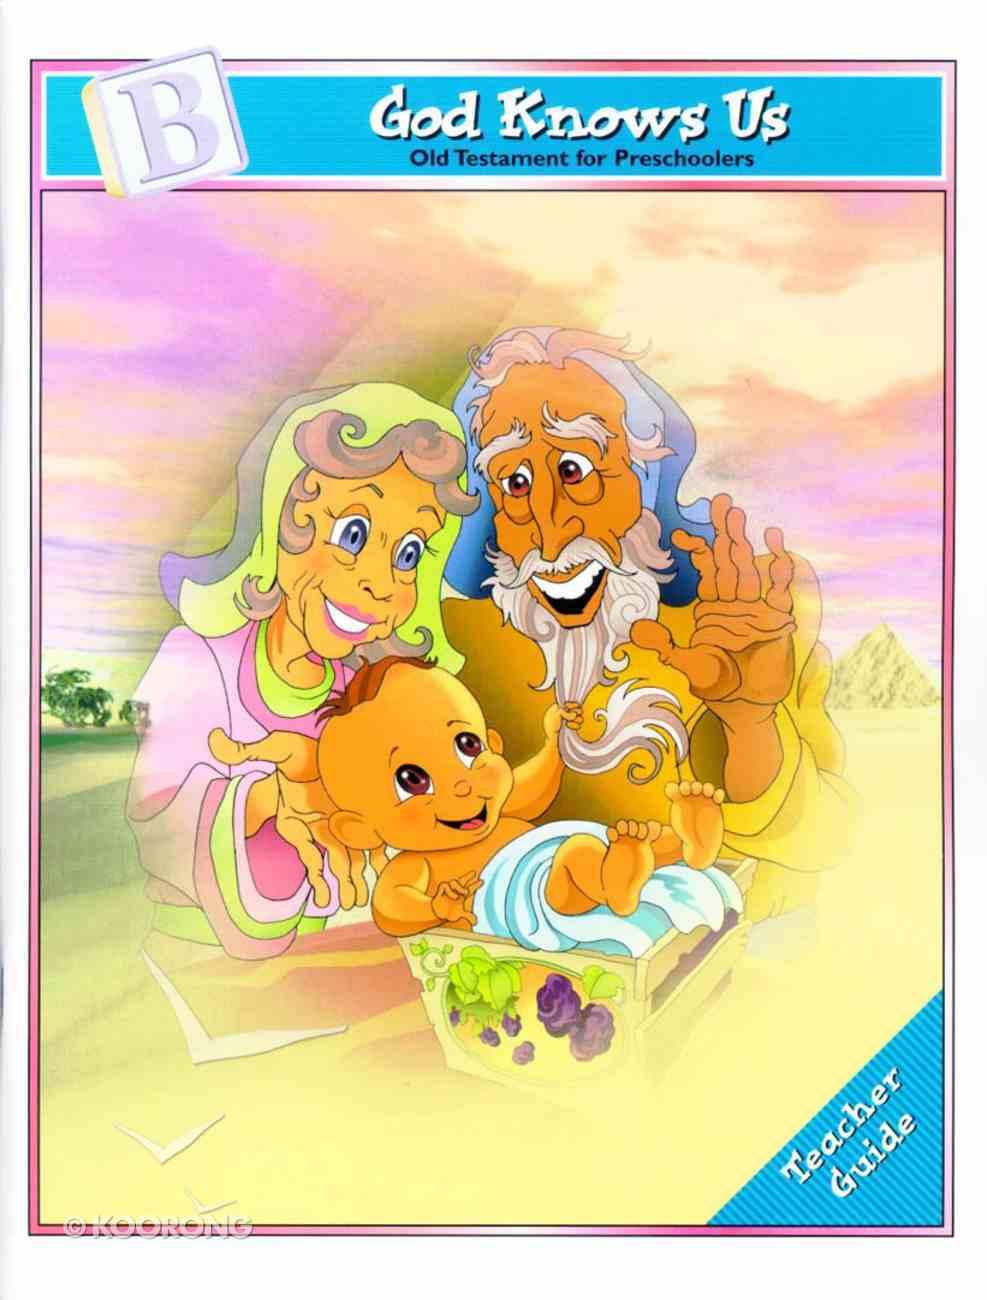 Dlc Preschool: OT, Unit B Ages 2-5 (Teacher) (Discipleland Preschool, Ages 3-5 Series) Paperback